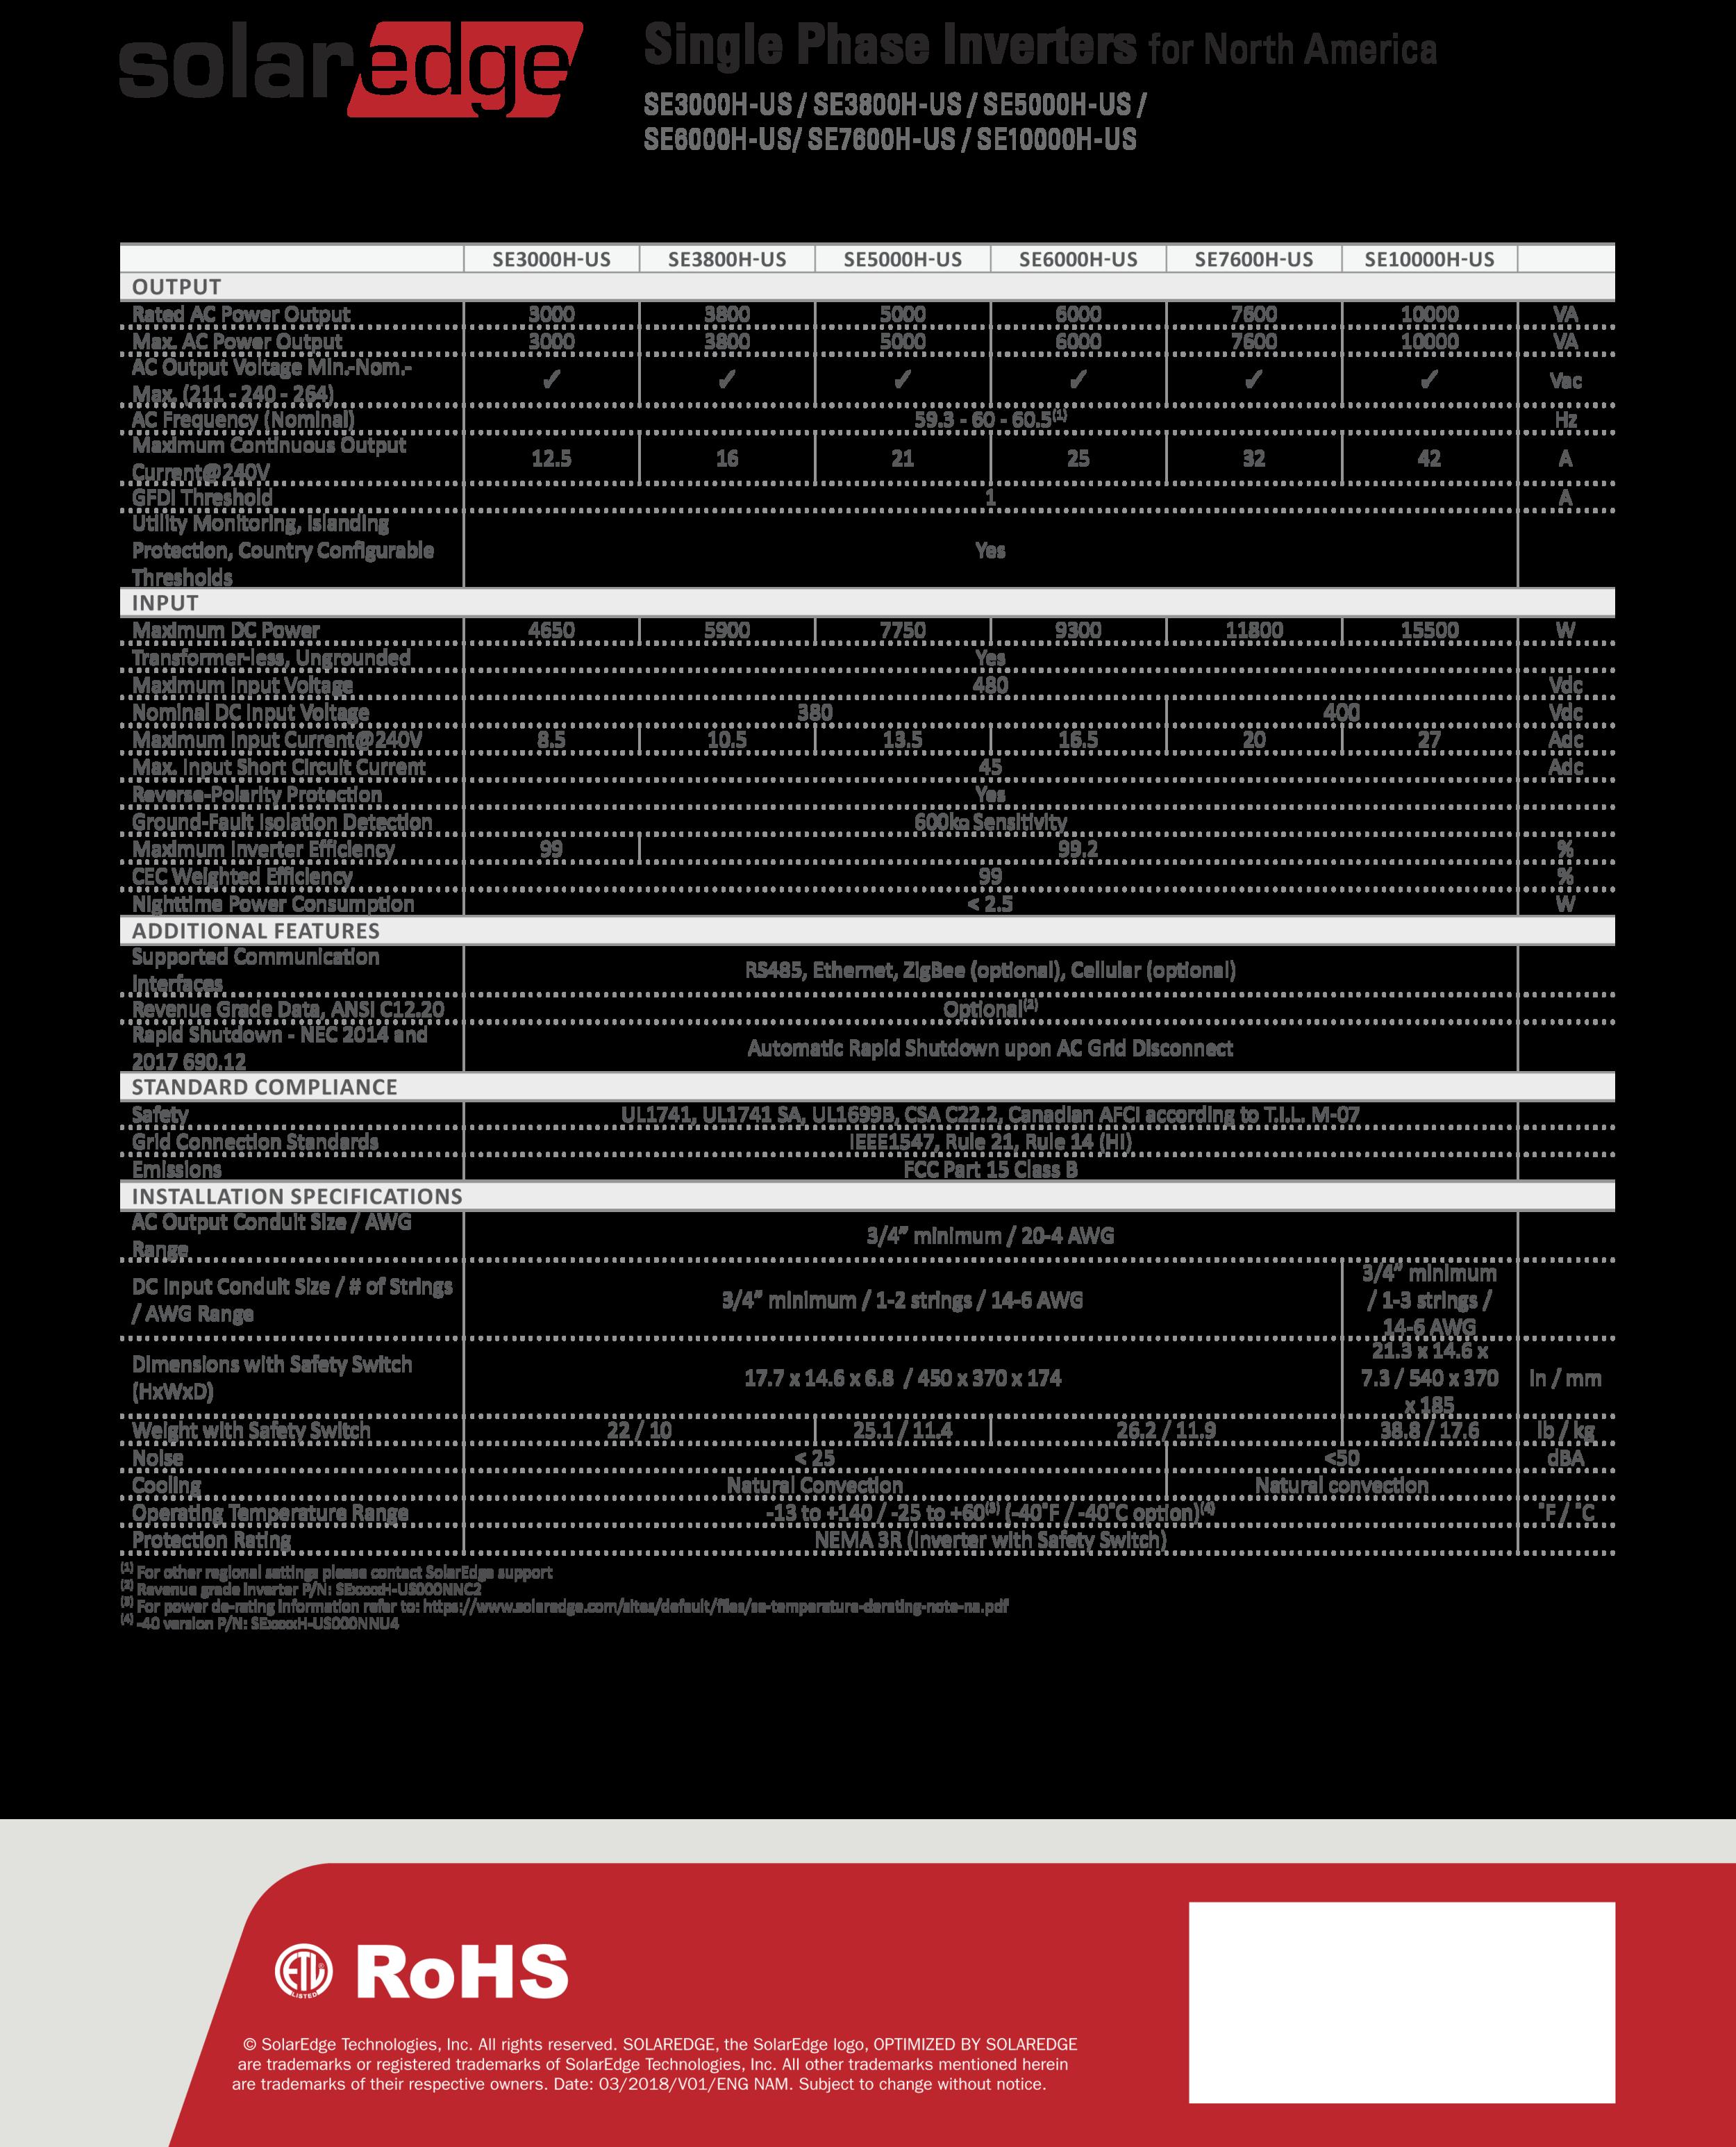 se-hd-wave-single-phase-inverter-datasheet-na-2.png